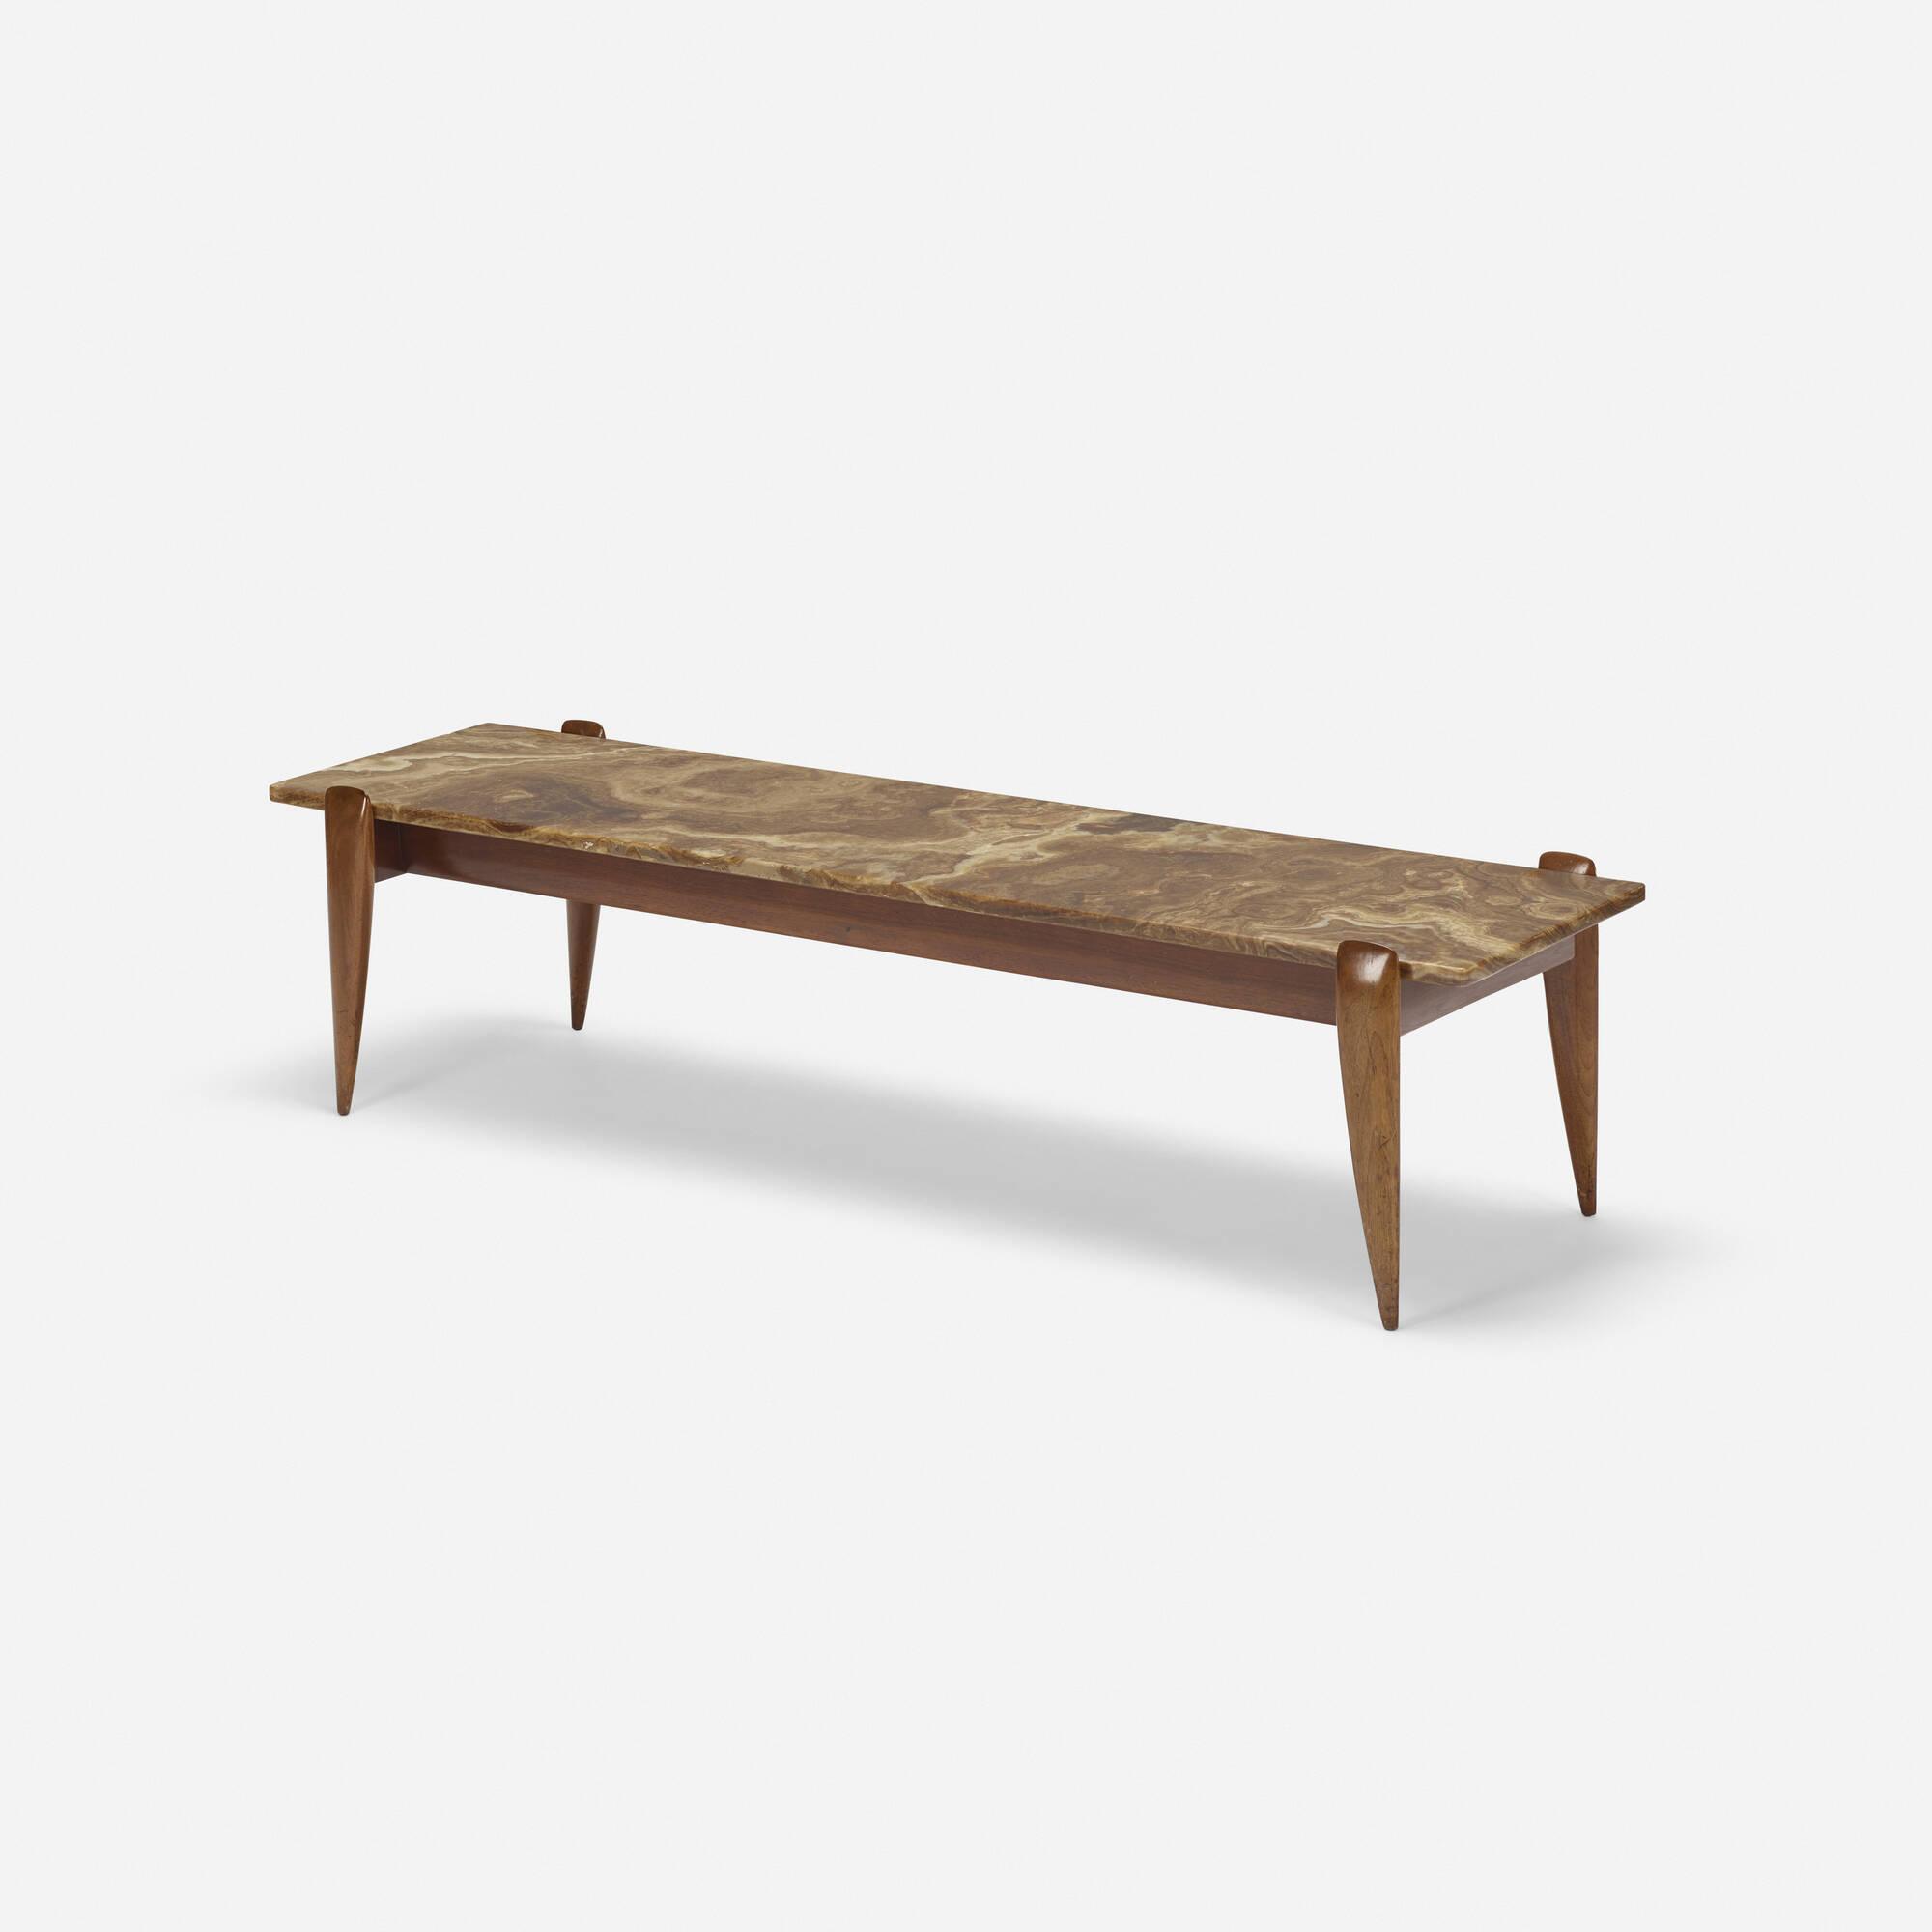 388 Gio Ponti Coffee Table